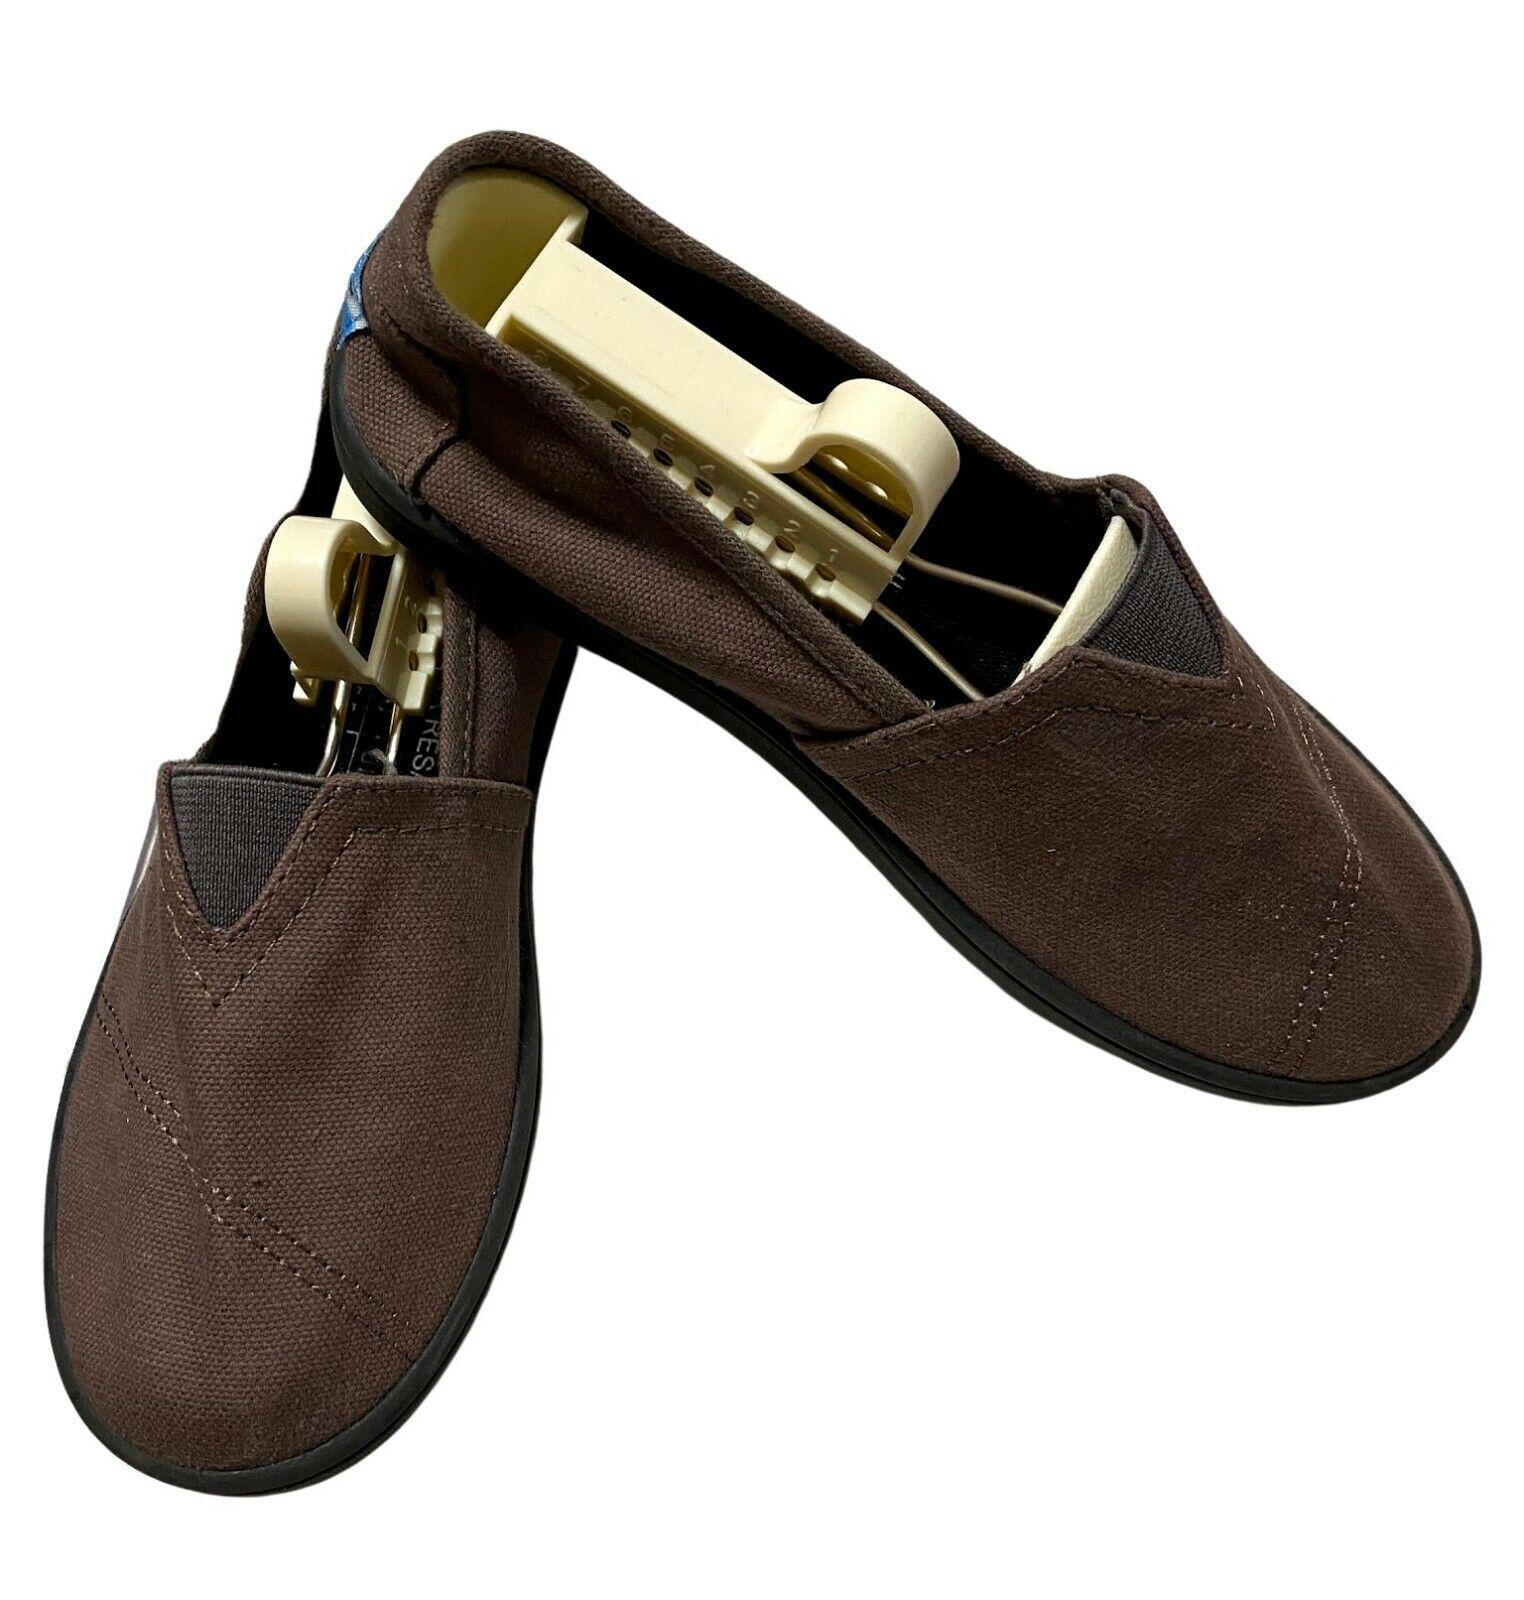 NWOT Unisex Women's/Kid's Toms Slip On Shoes Size 5